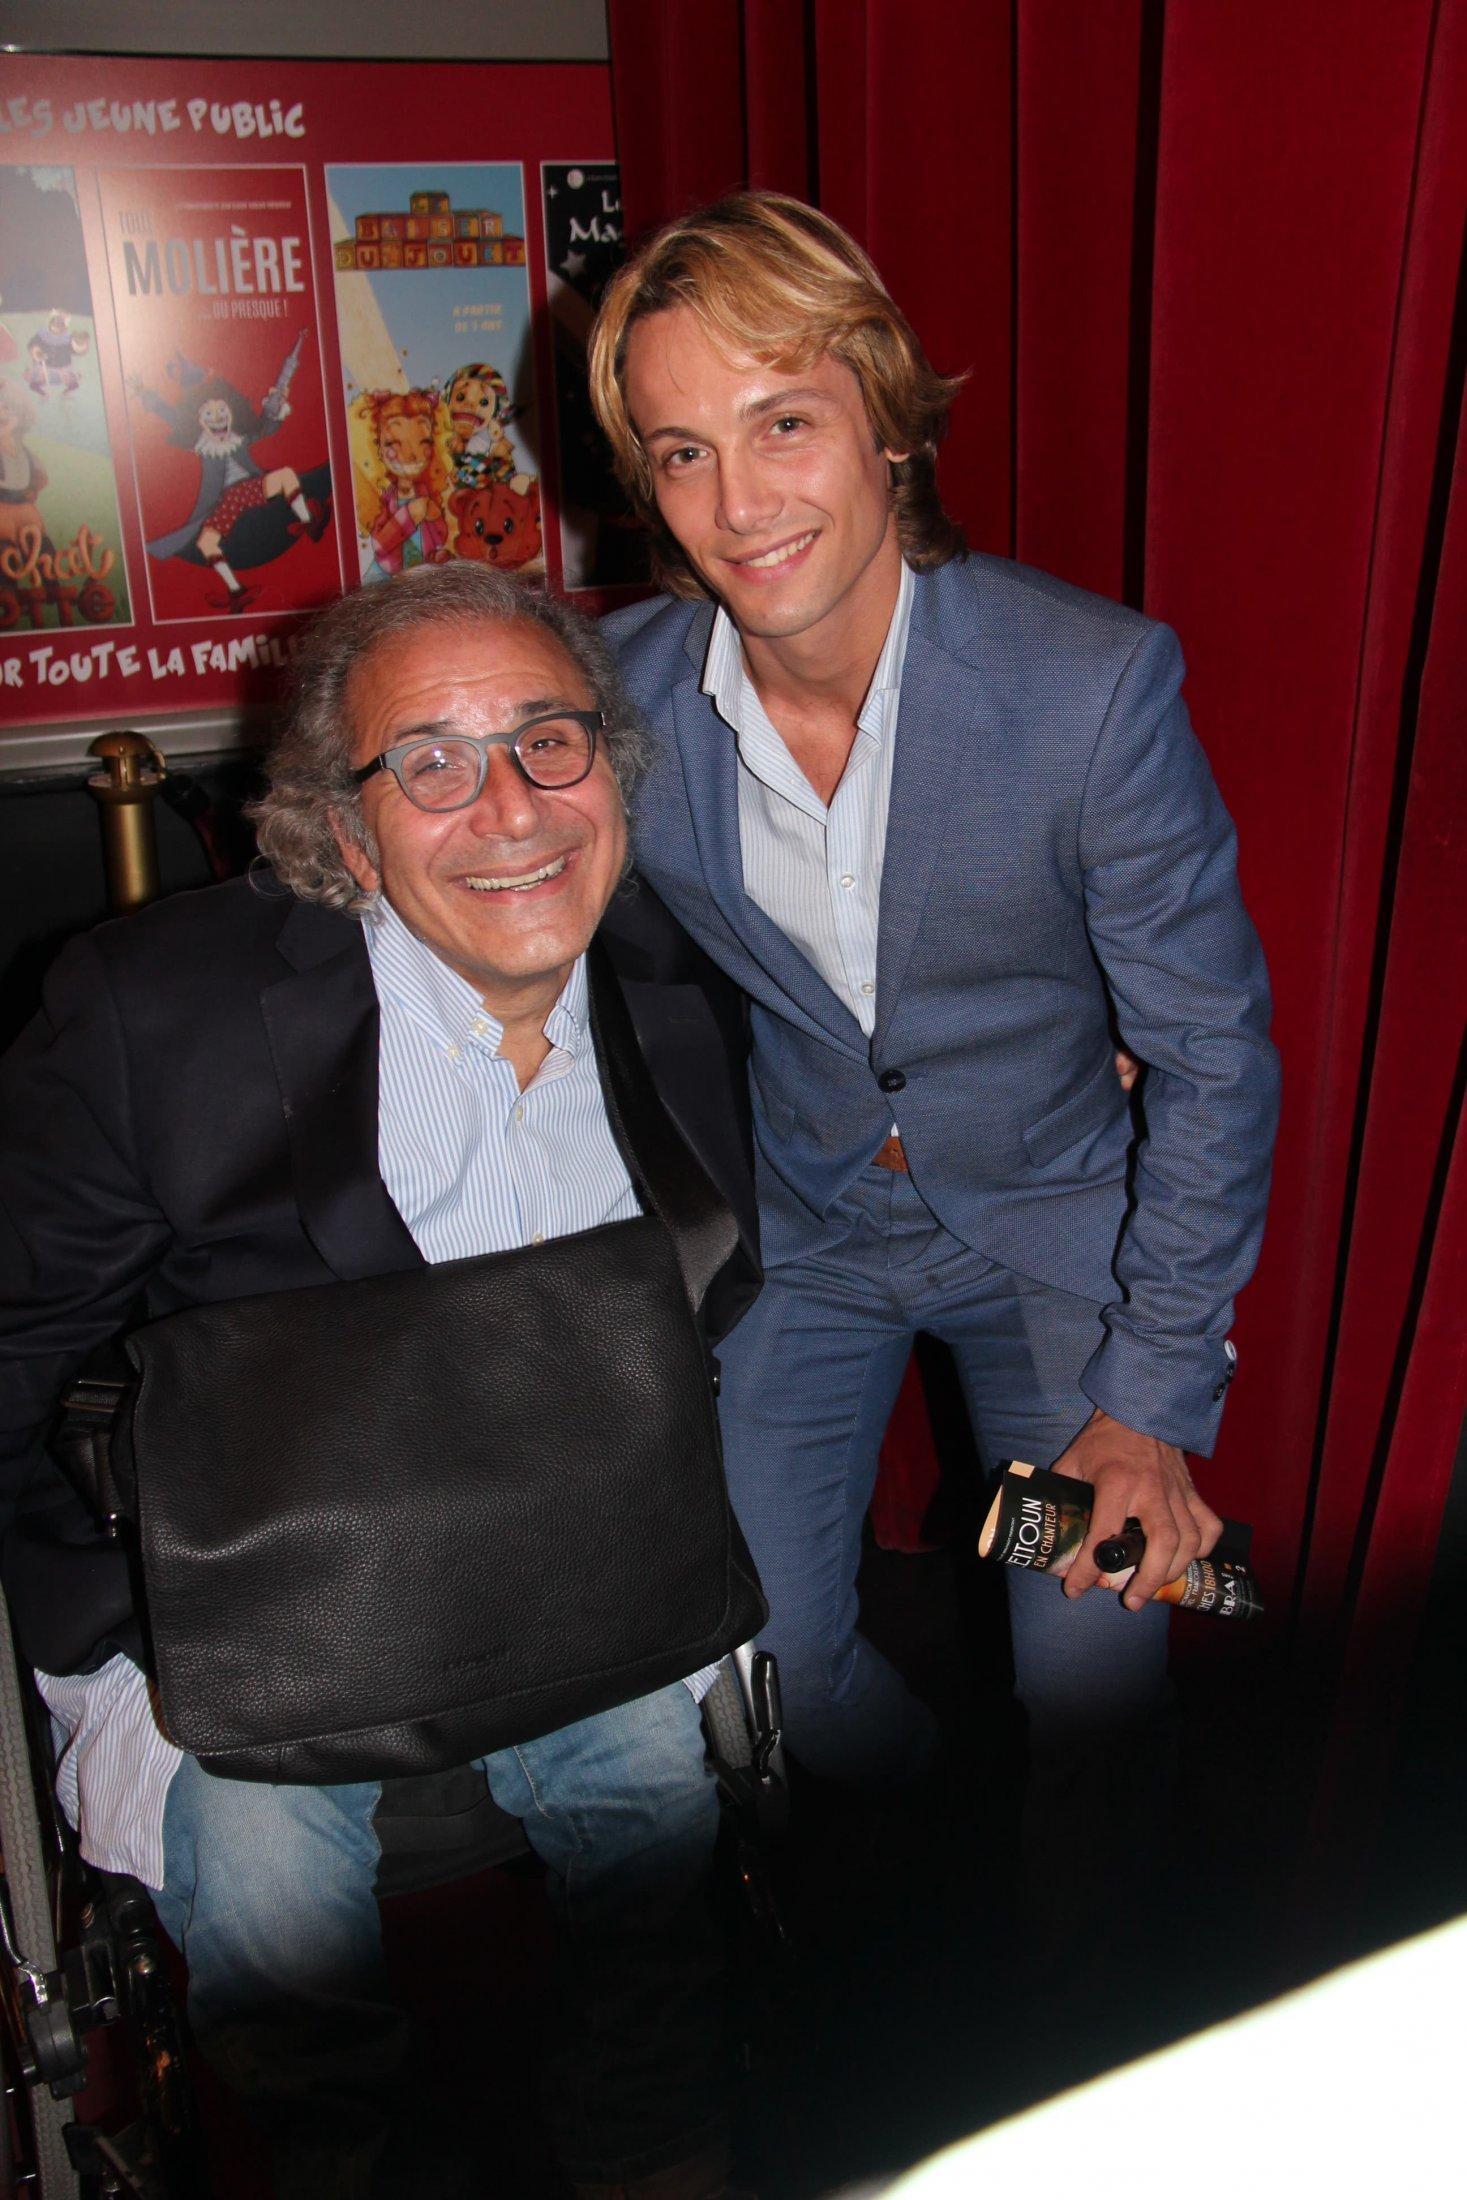 Avec Frédéric Zeitoun